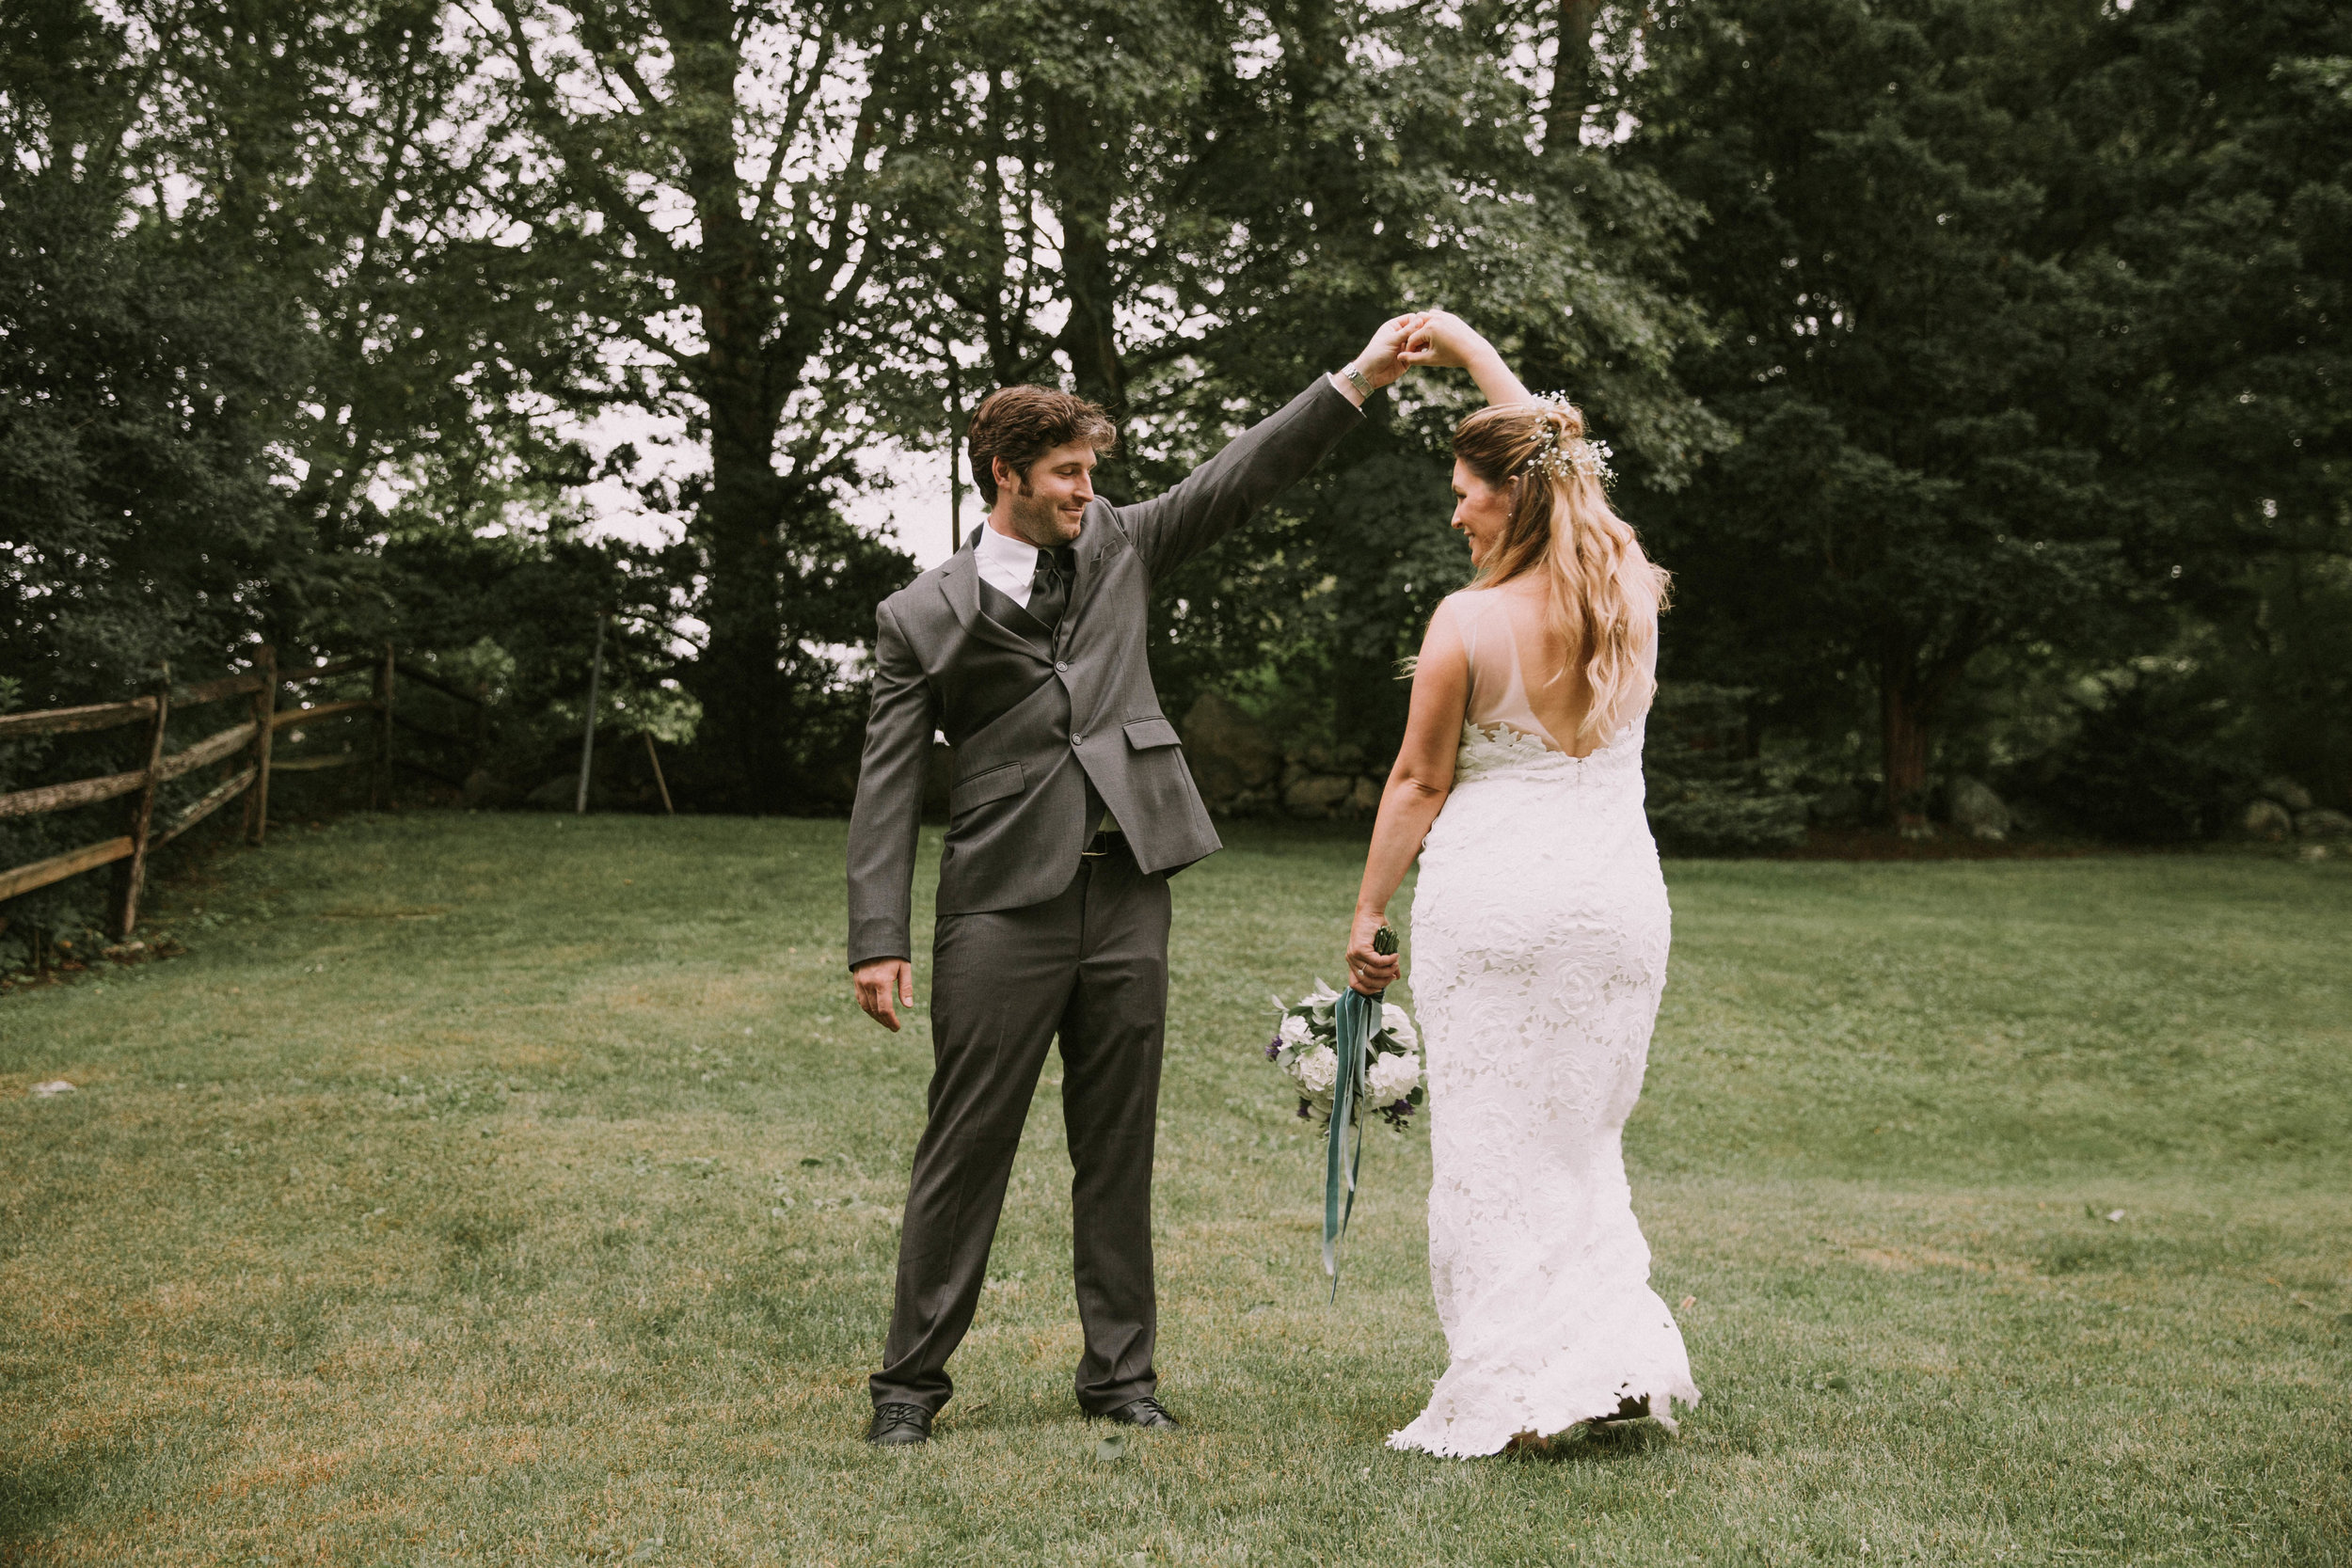 spitale-elopement-blog-1-of-18.jpg